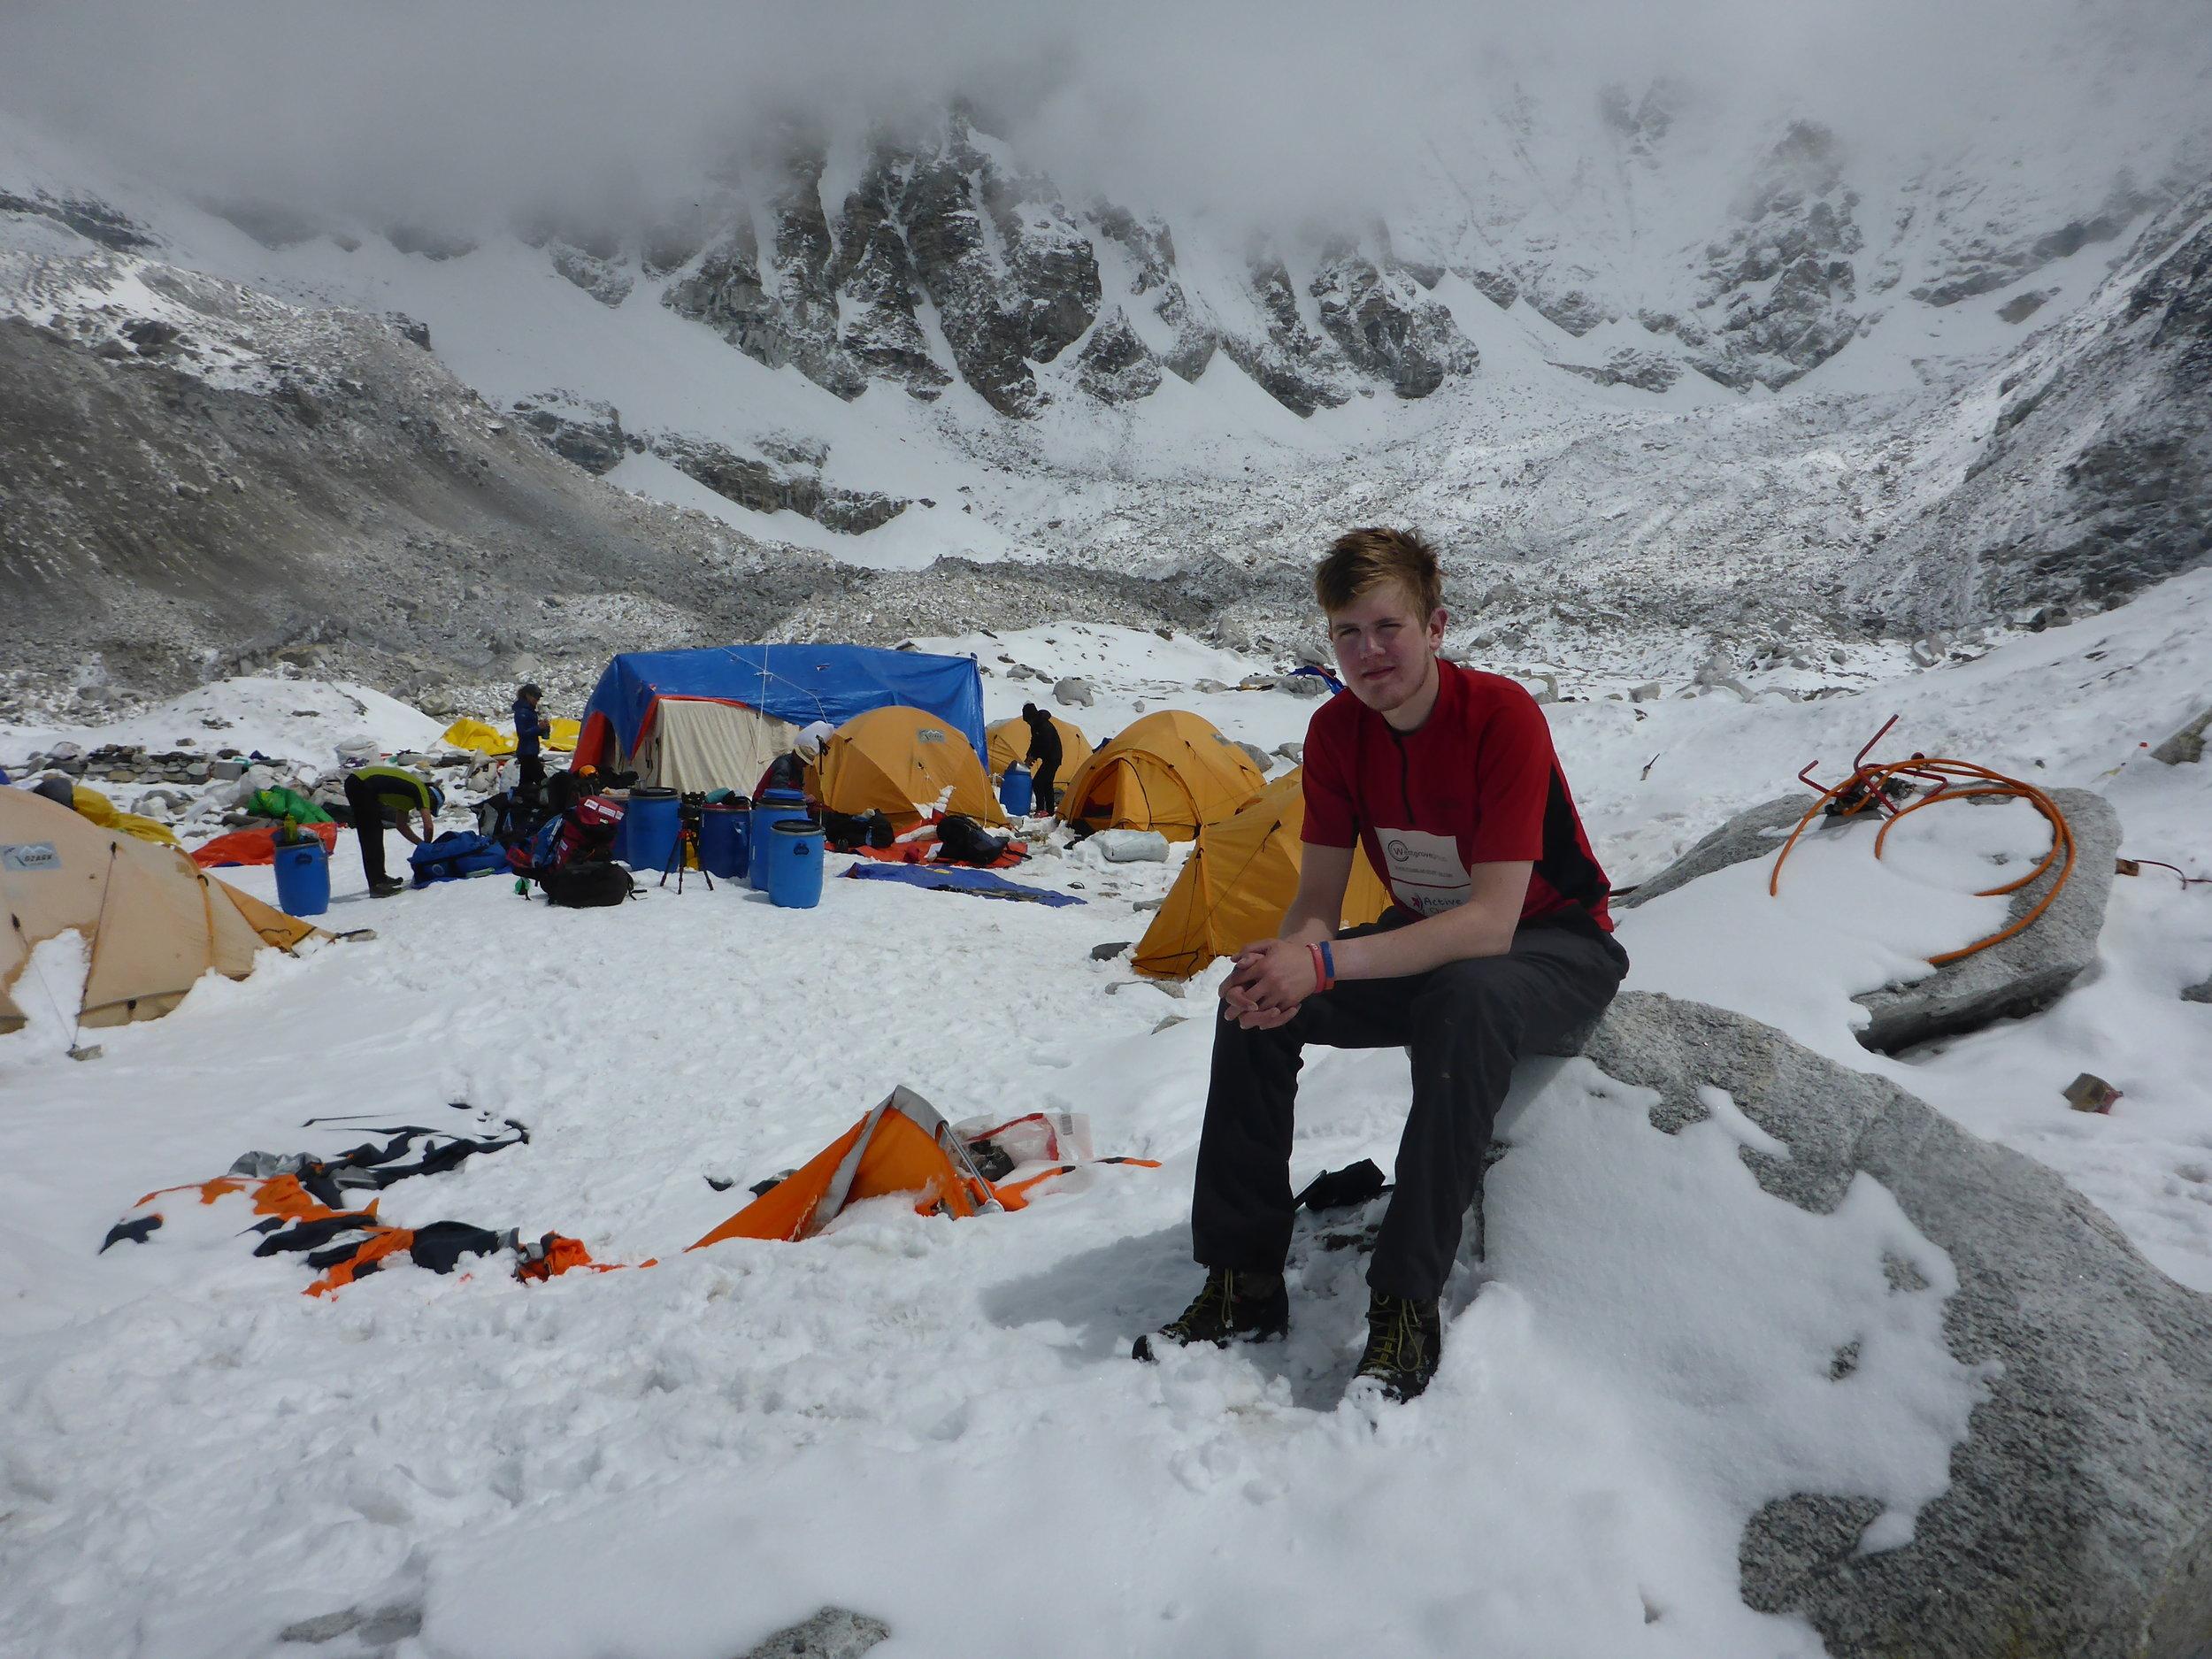 Alex Staniforth - Record-breaking adventurer, inspirational keynote speaker, ambassador and author